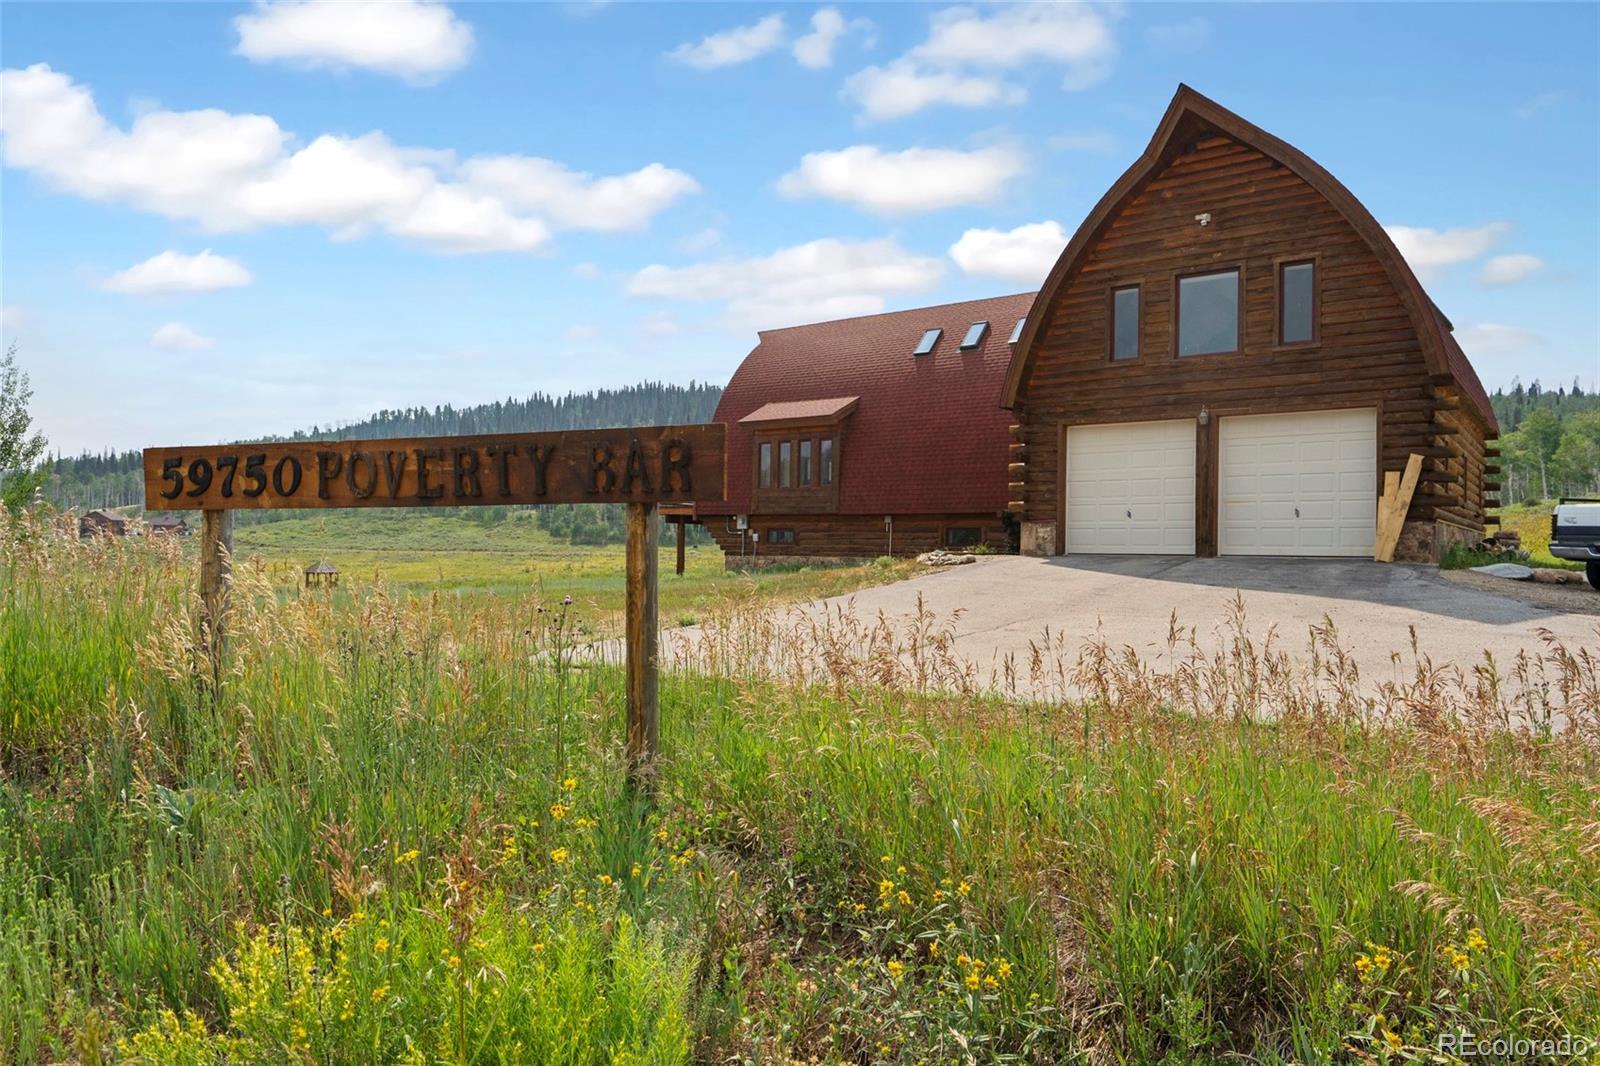 59750 County Road 129 photo